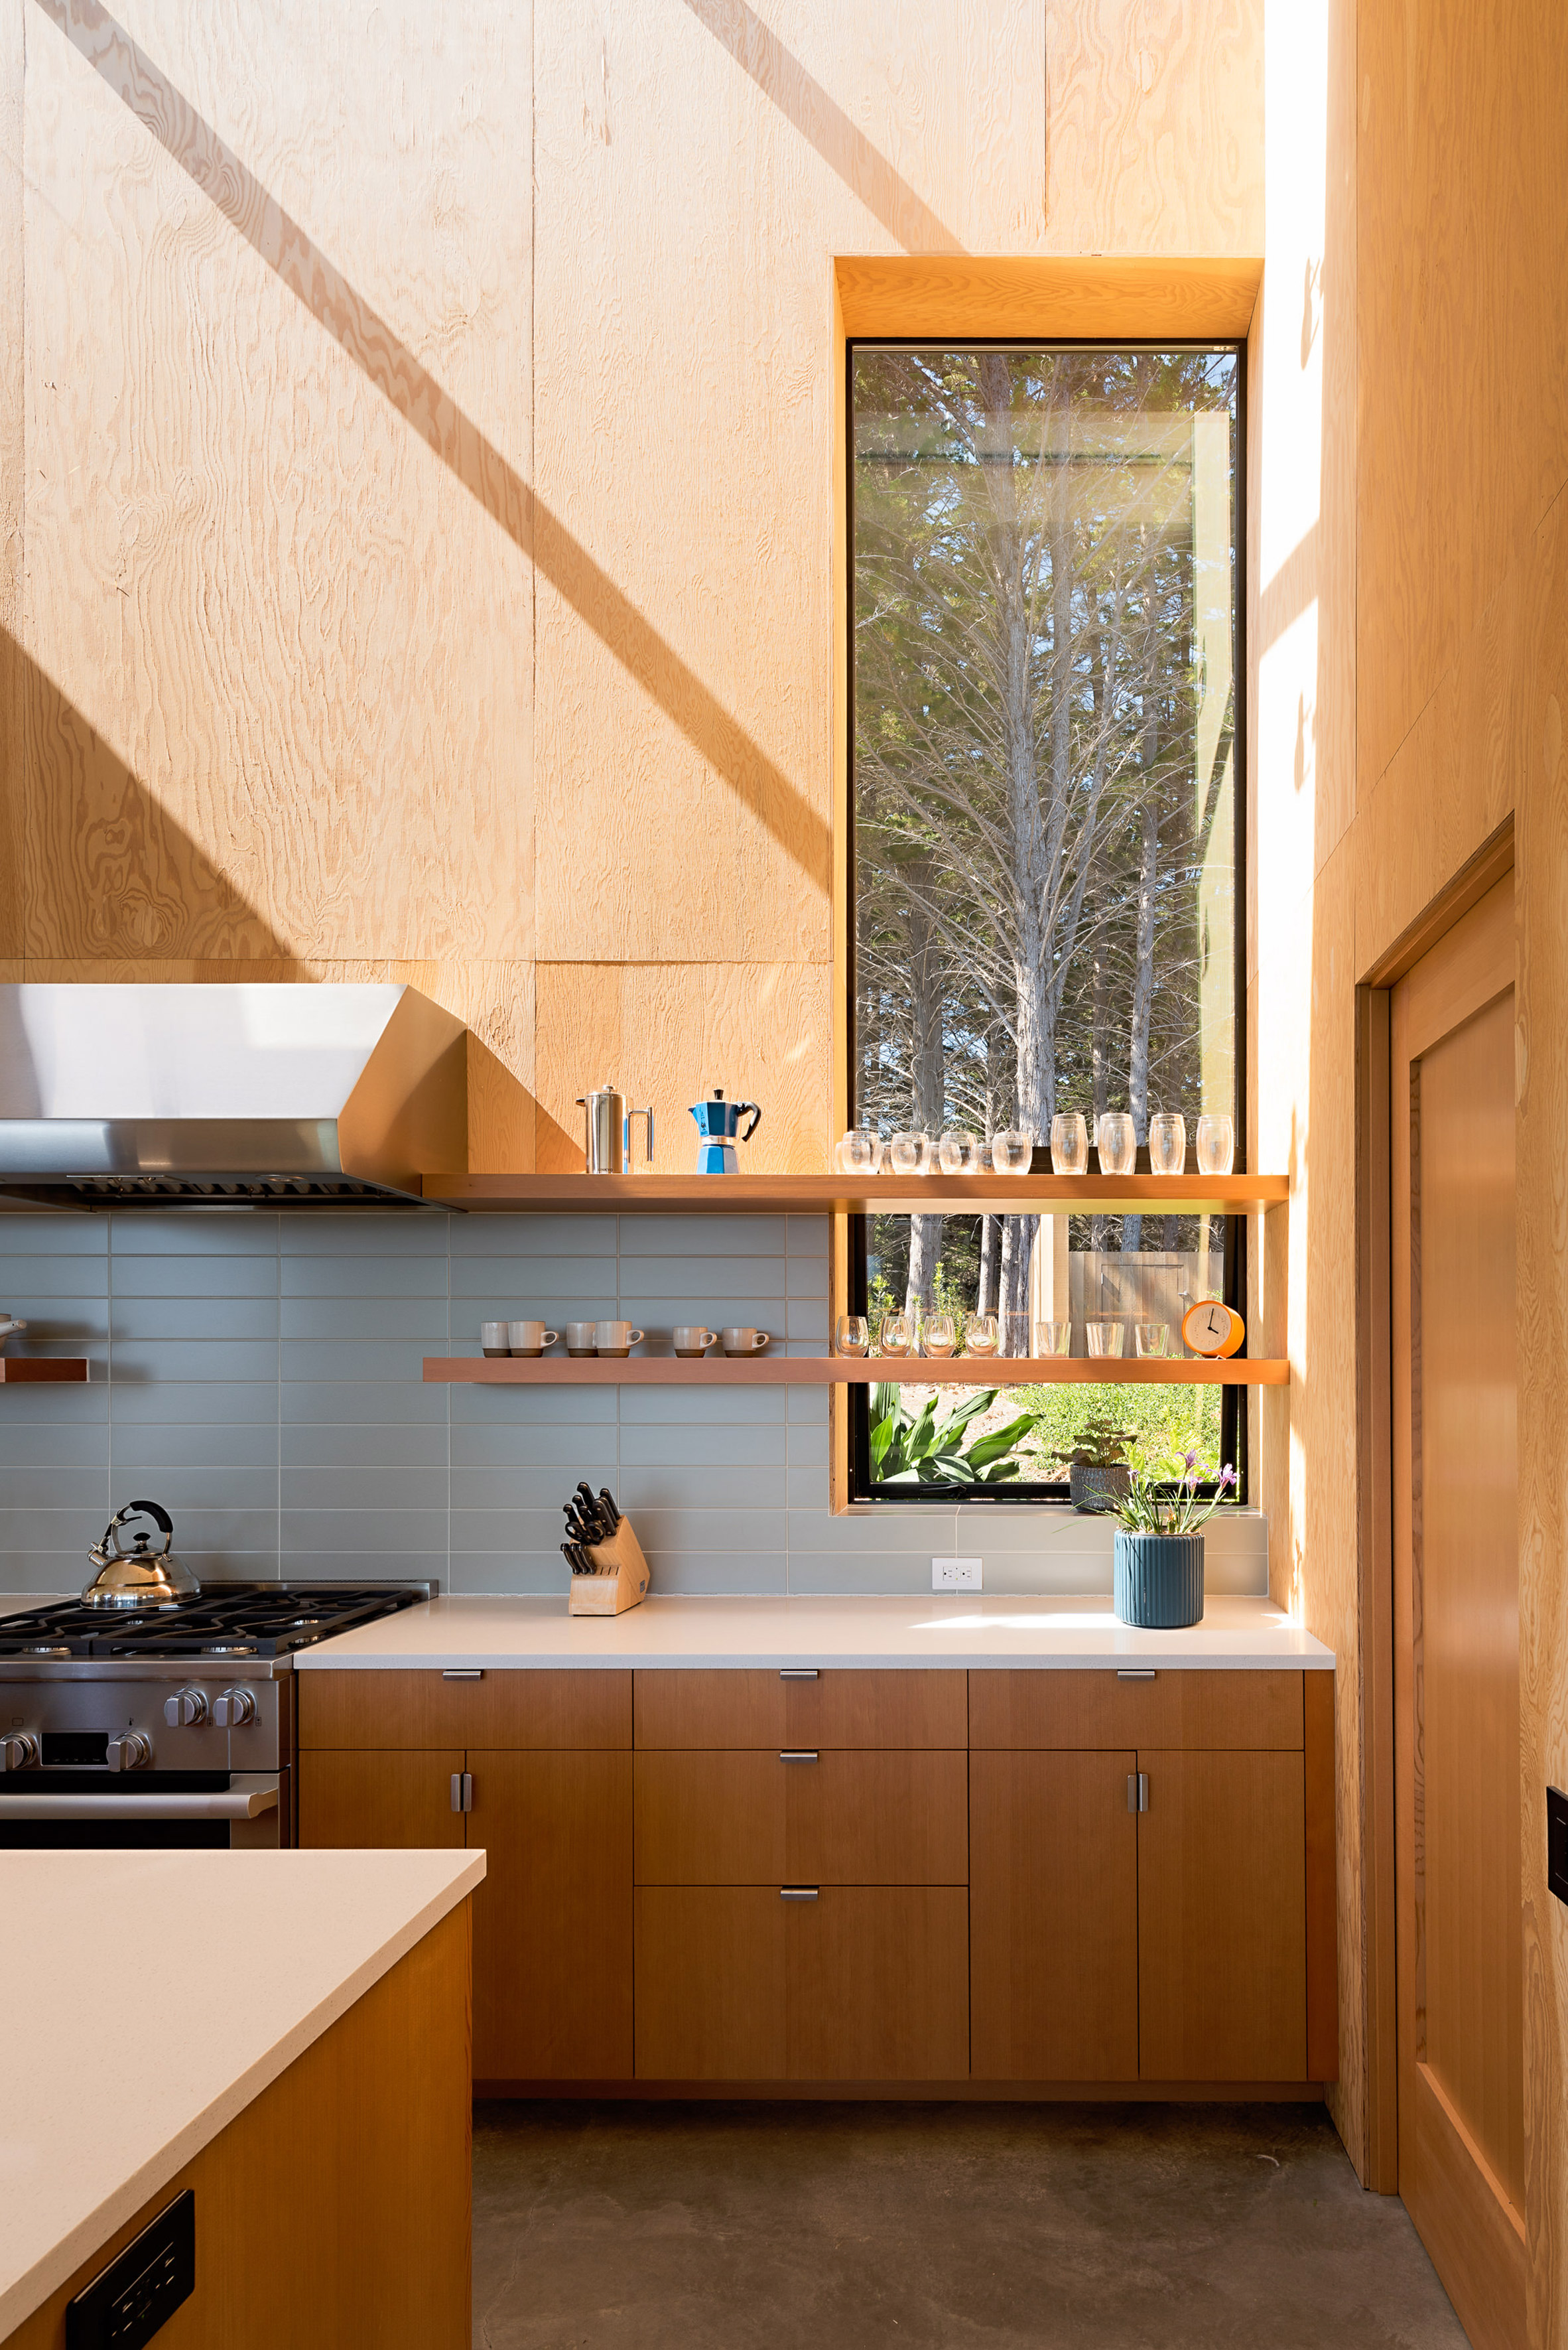 nhà bên biển coastal-retreat-malcolm-davis-architecture-sea-ranch-sonoma-county-califorinia-relaxing-space-elledecoration vn 9